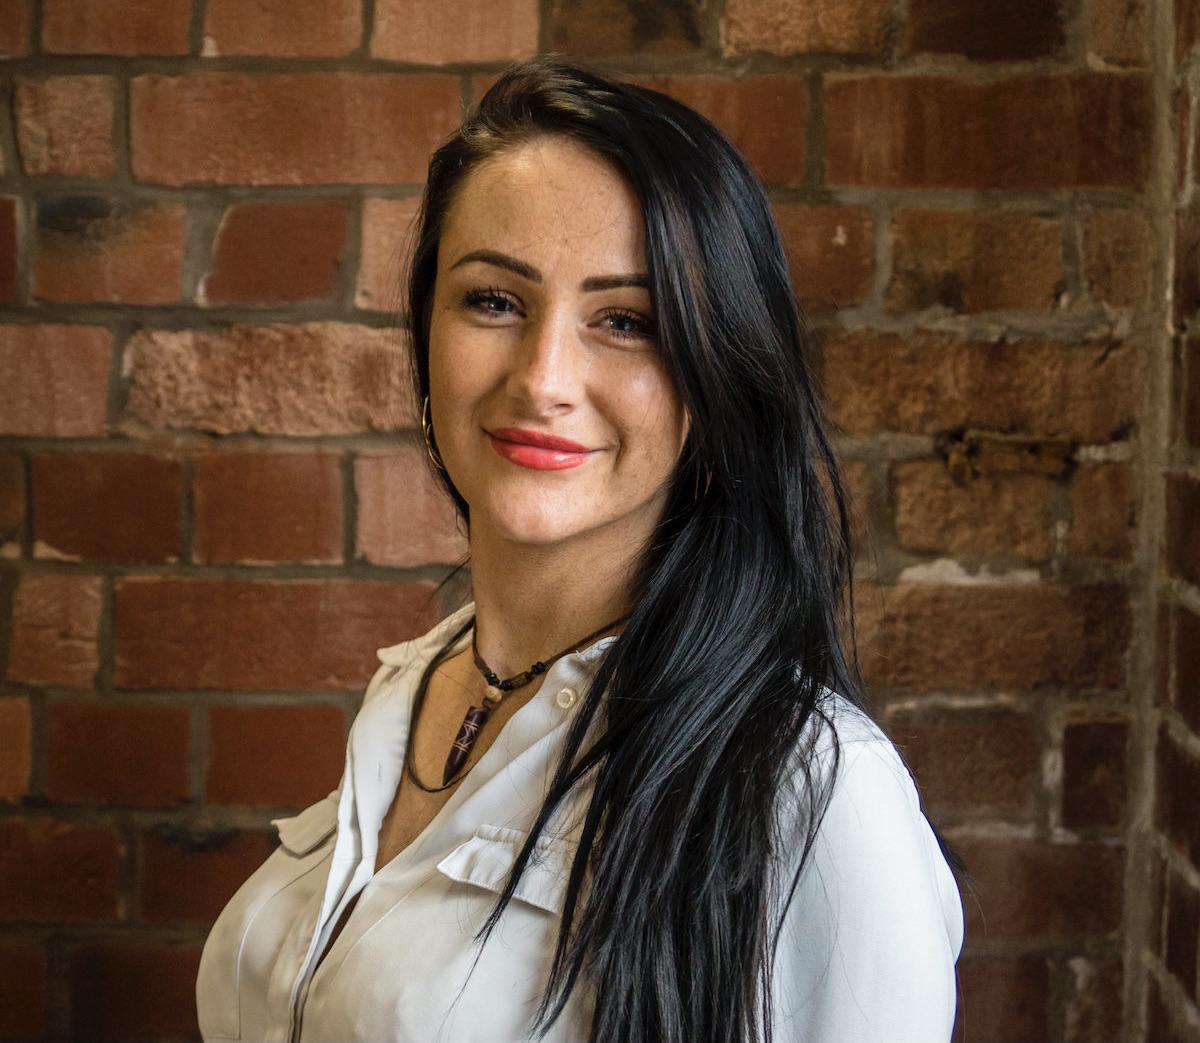 Becky Hilton, cofounder of food tech startup The Modern Milkman